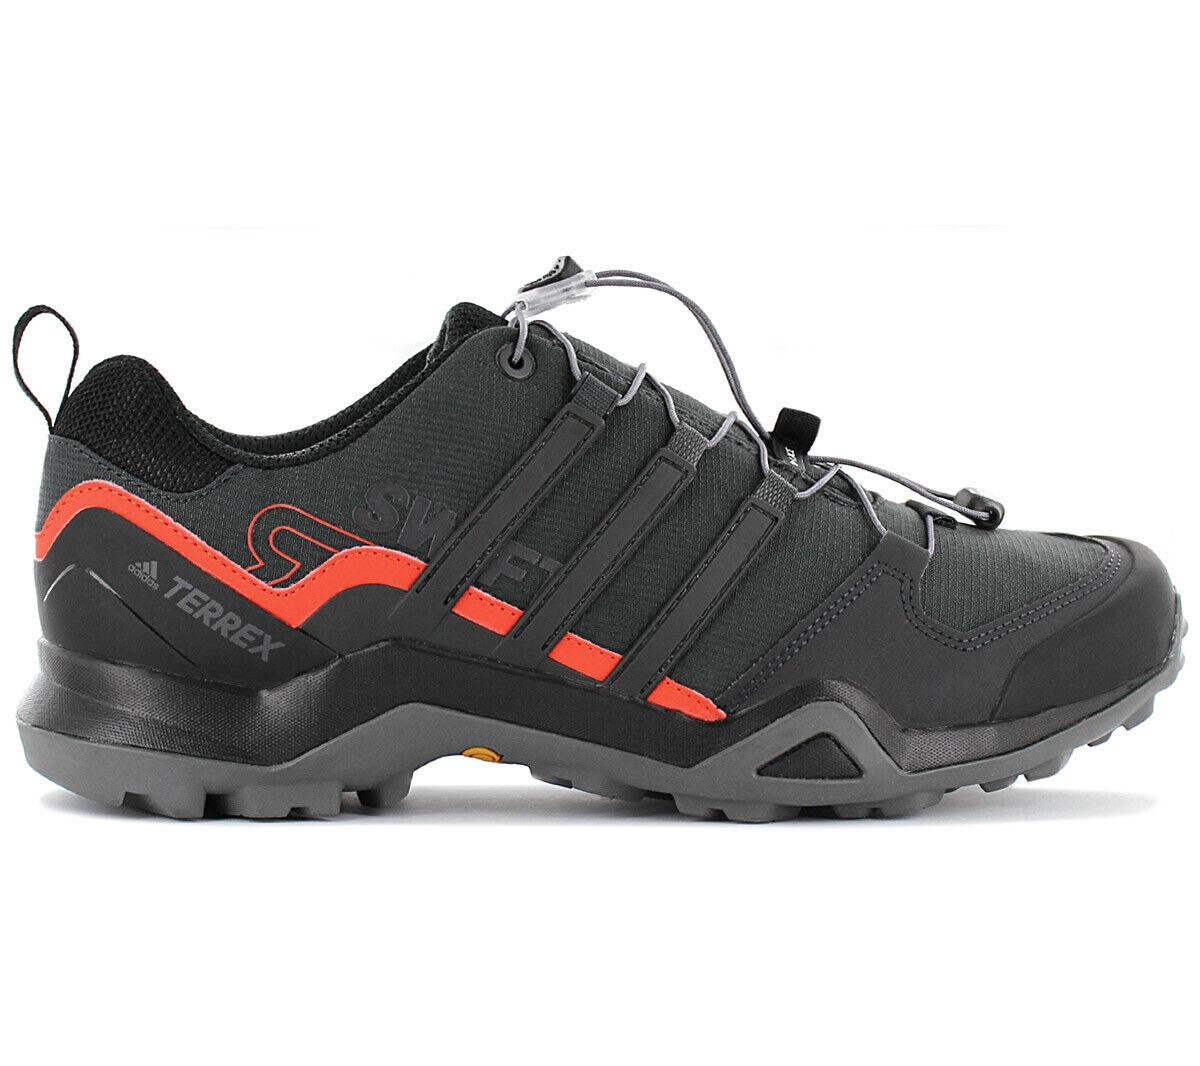 Adidas Terrex Swift R2 Herren Wanderschuhe AC7982 Outdoor Trail Schuh Sportschuh